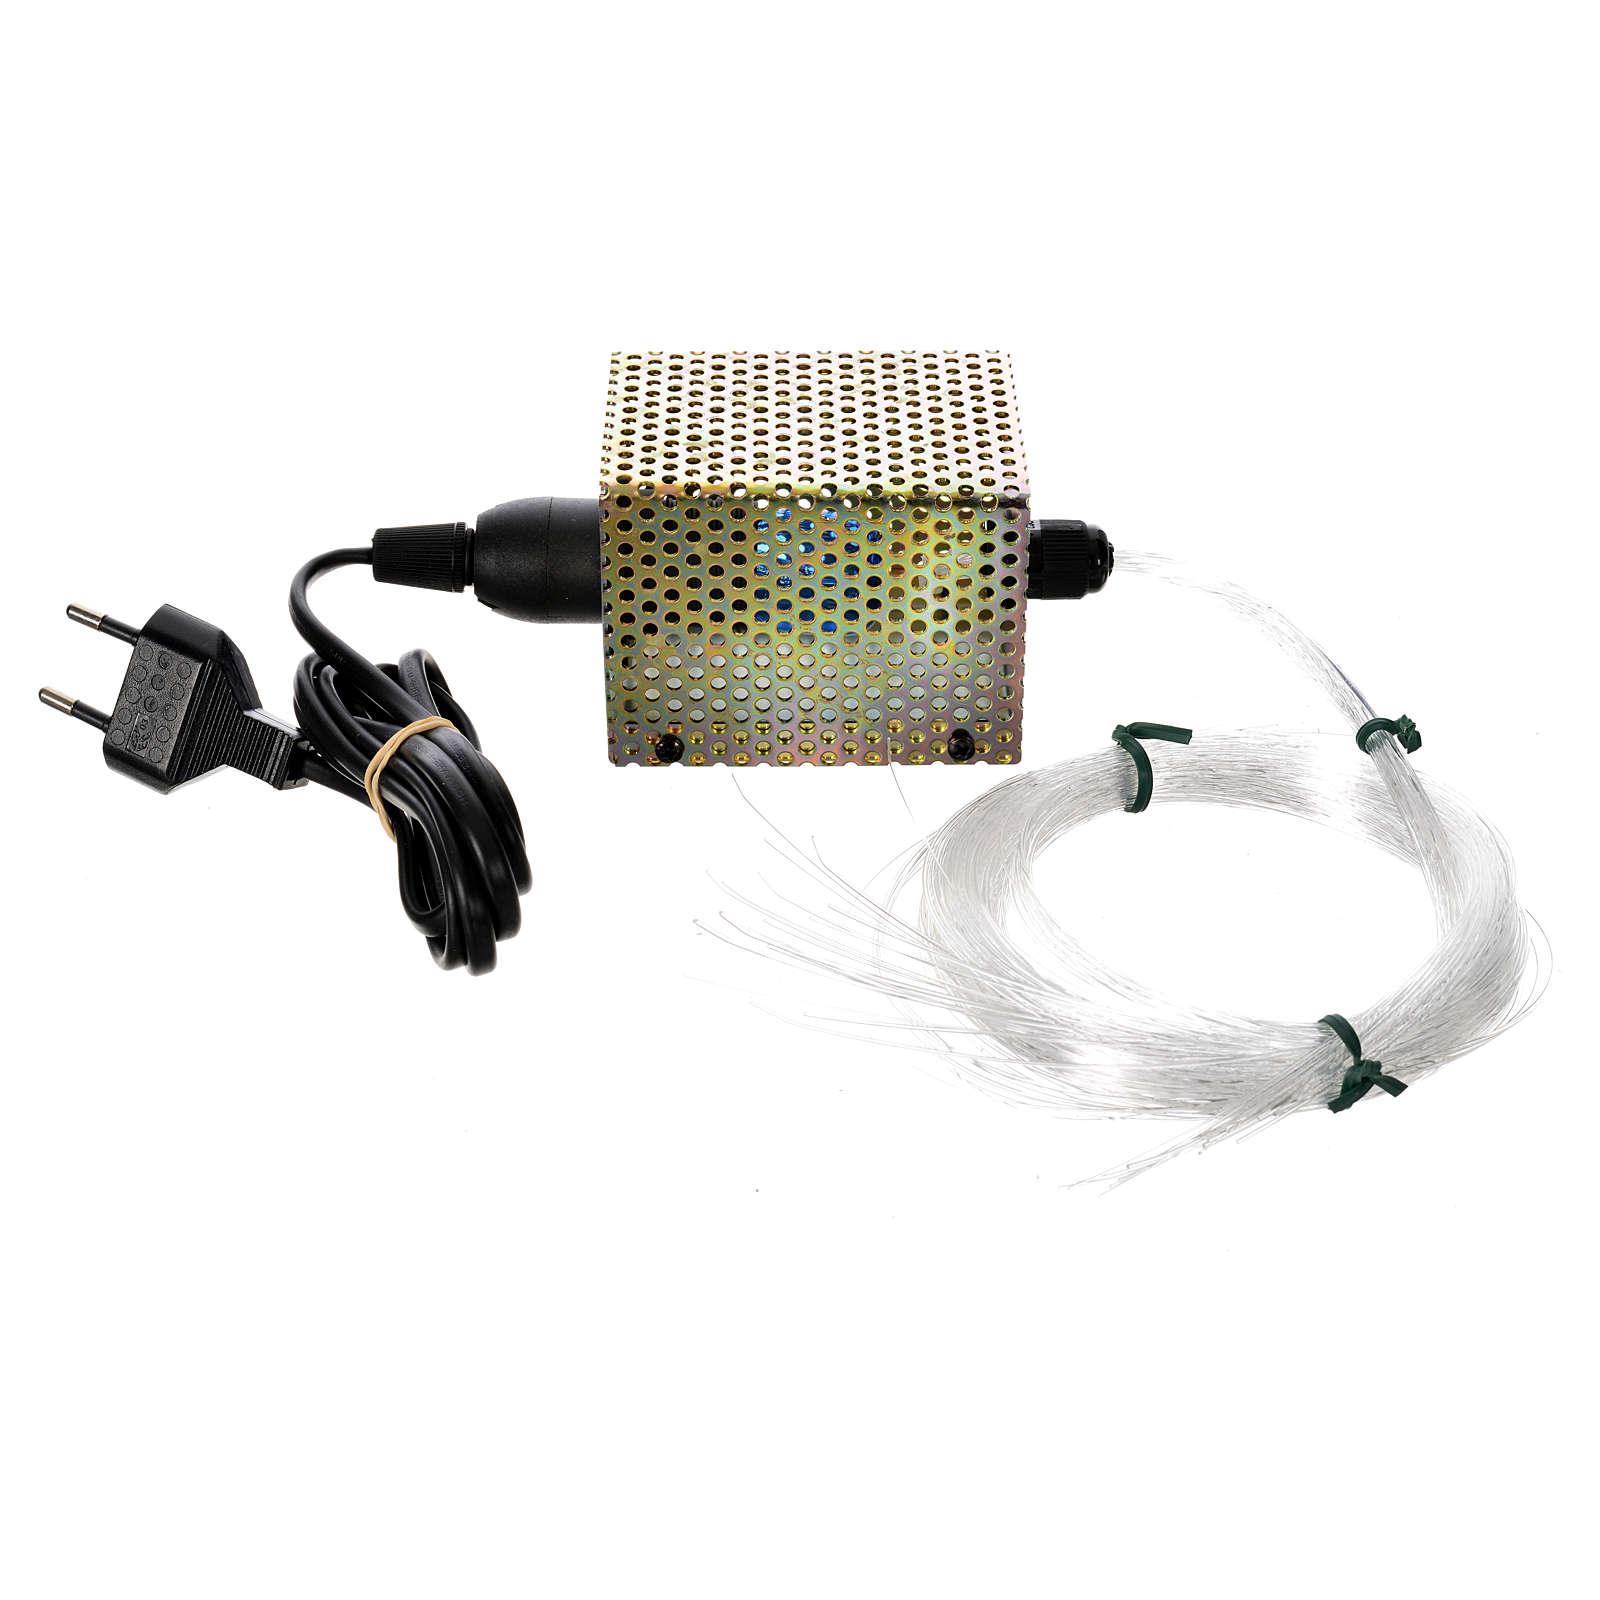 Optical fiber stars, 50 wires 25W 220V 4